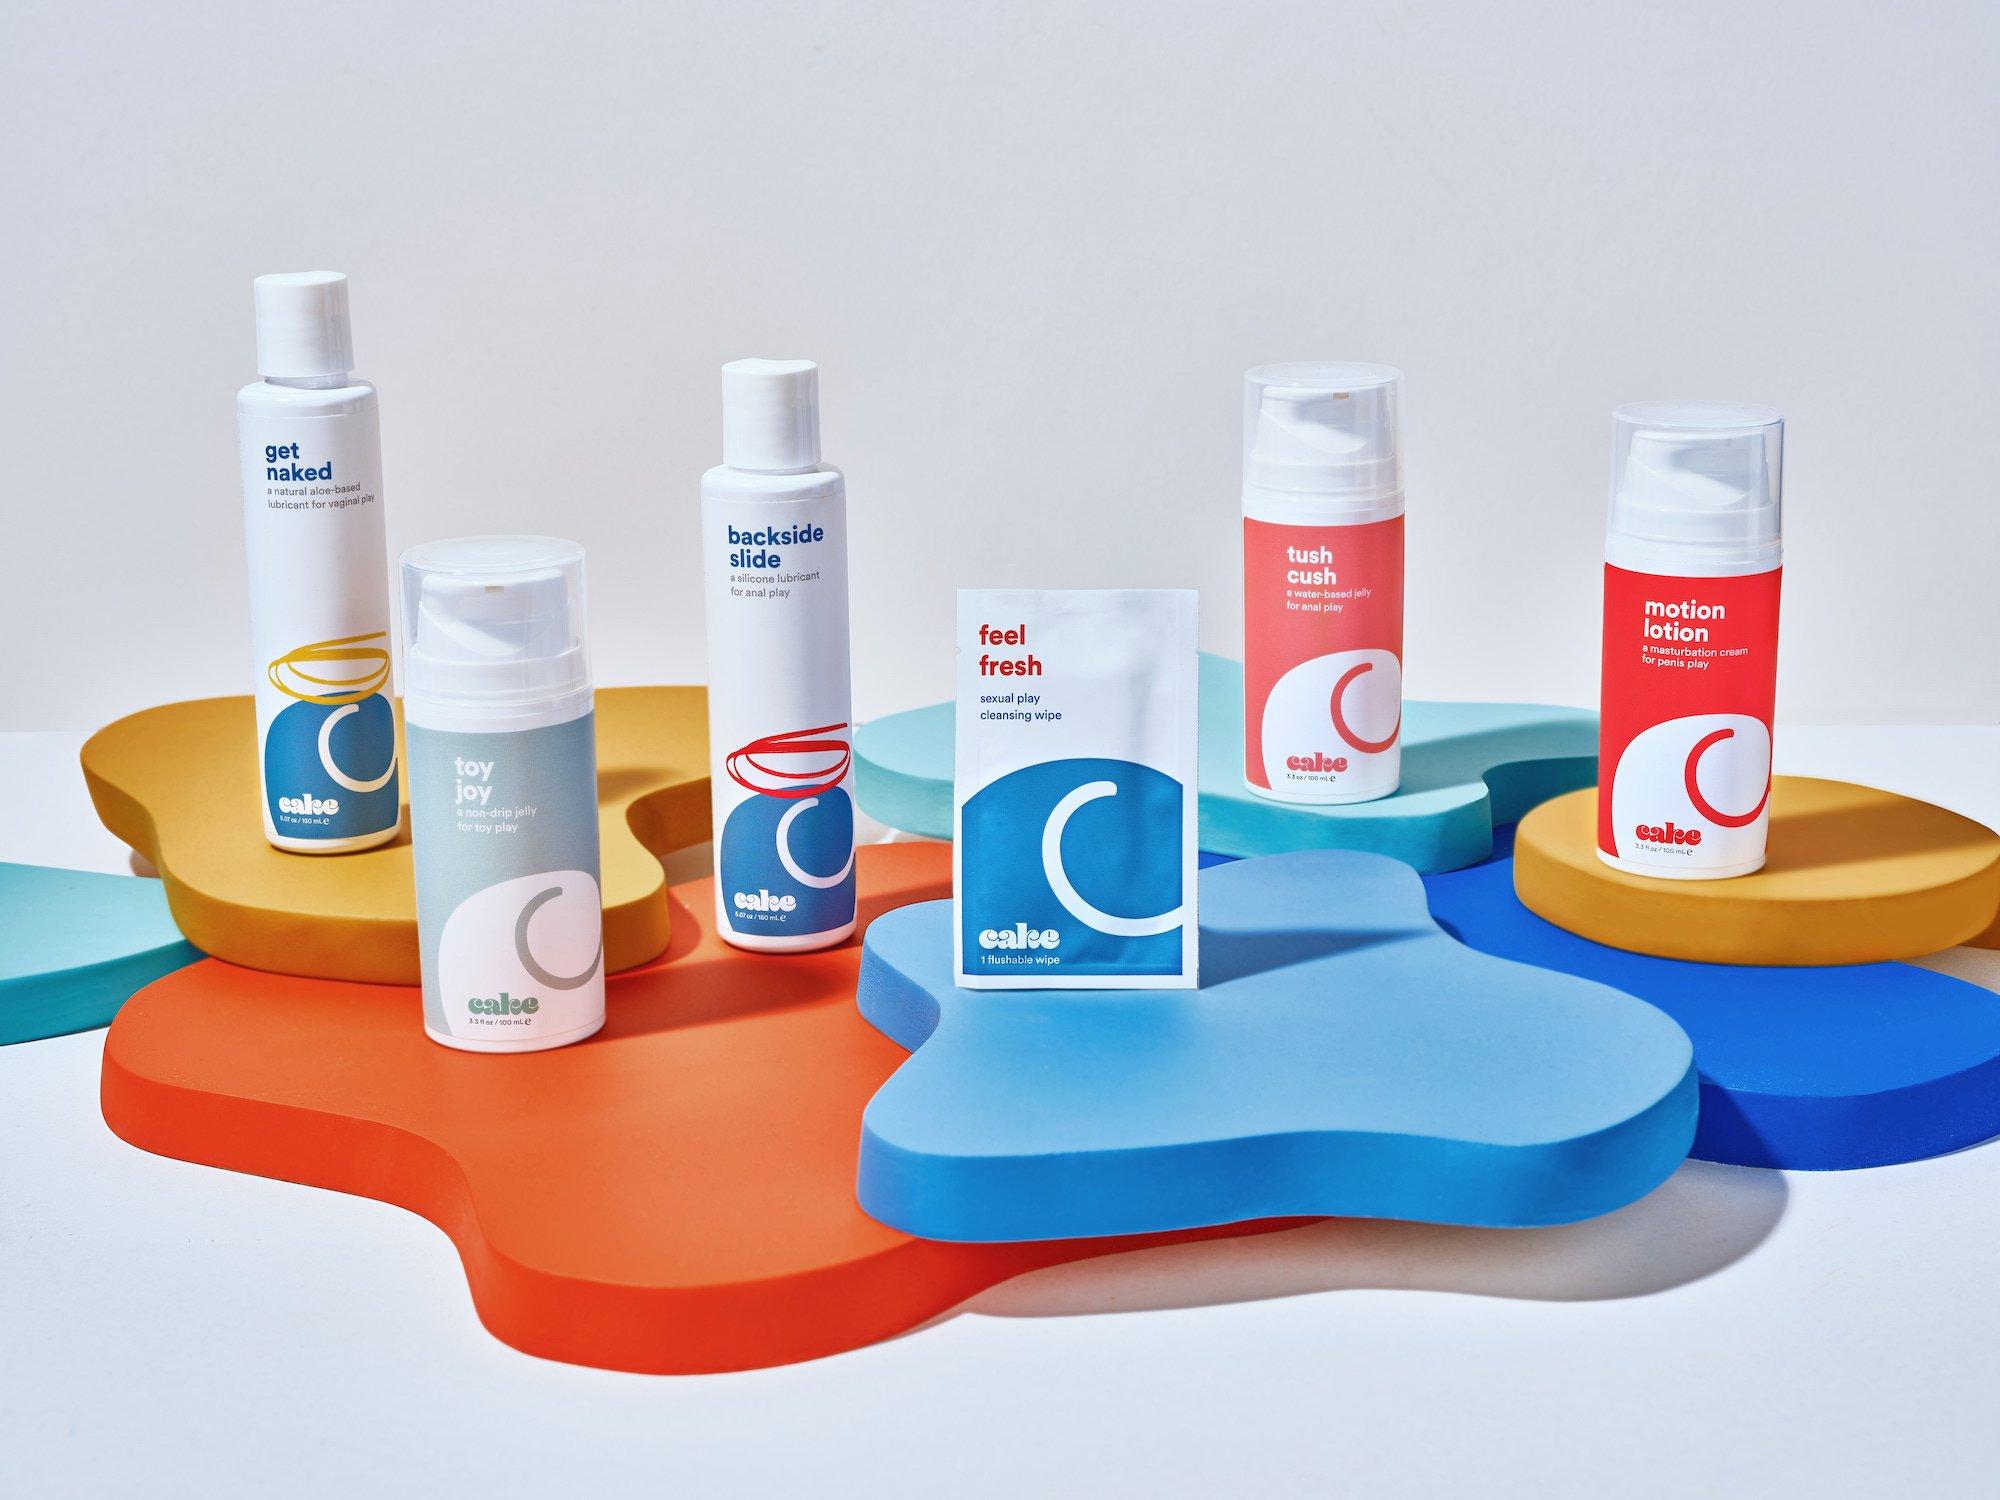 Cake_sexual-wellness-dtc-brand-foundry-ventures